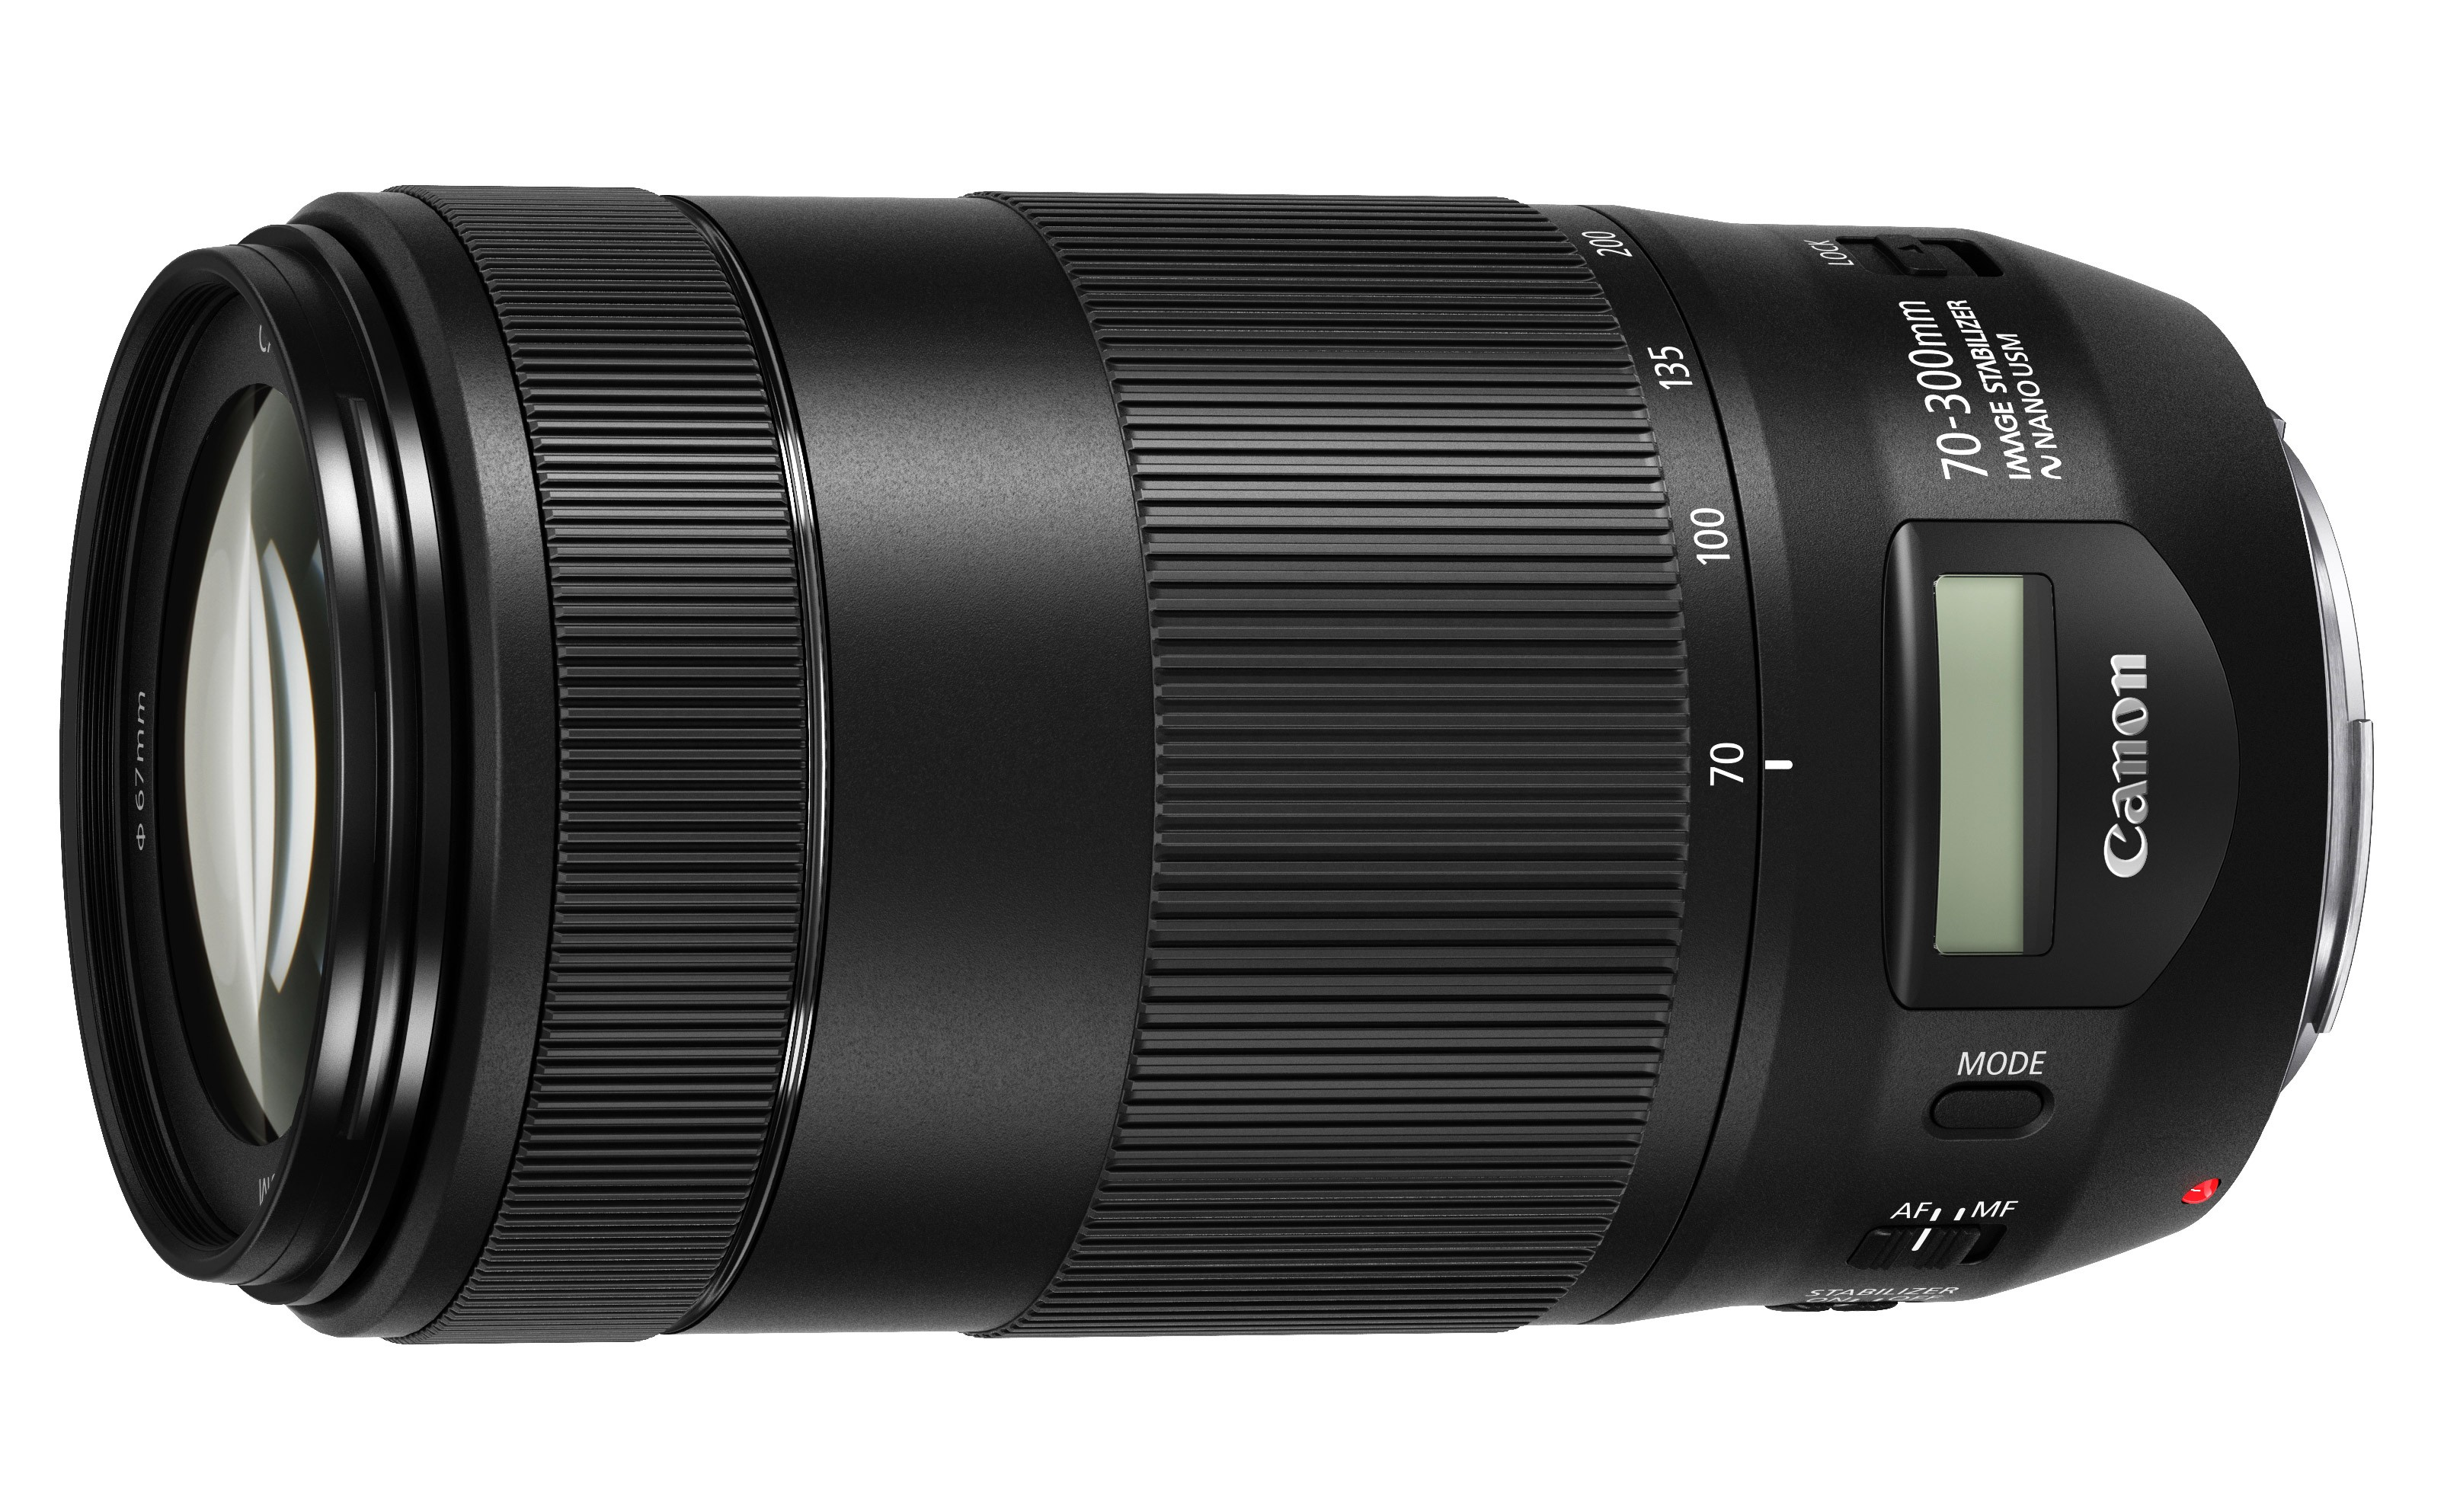 Obiettivo Canon EF 70-300mm f/4.0-5.6 IS II USM